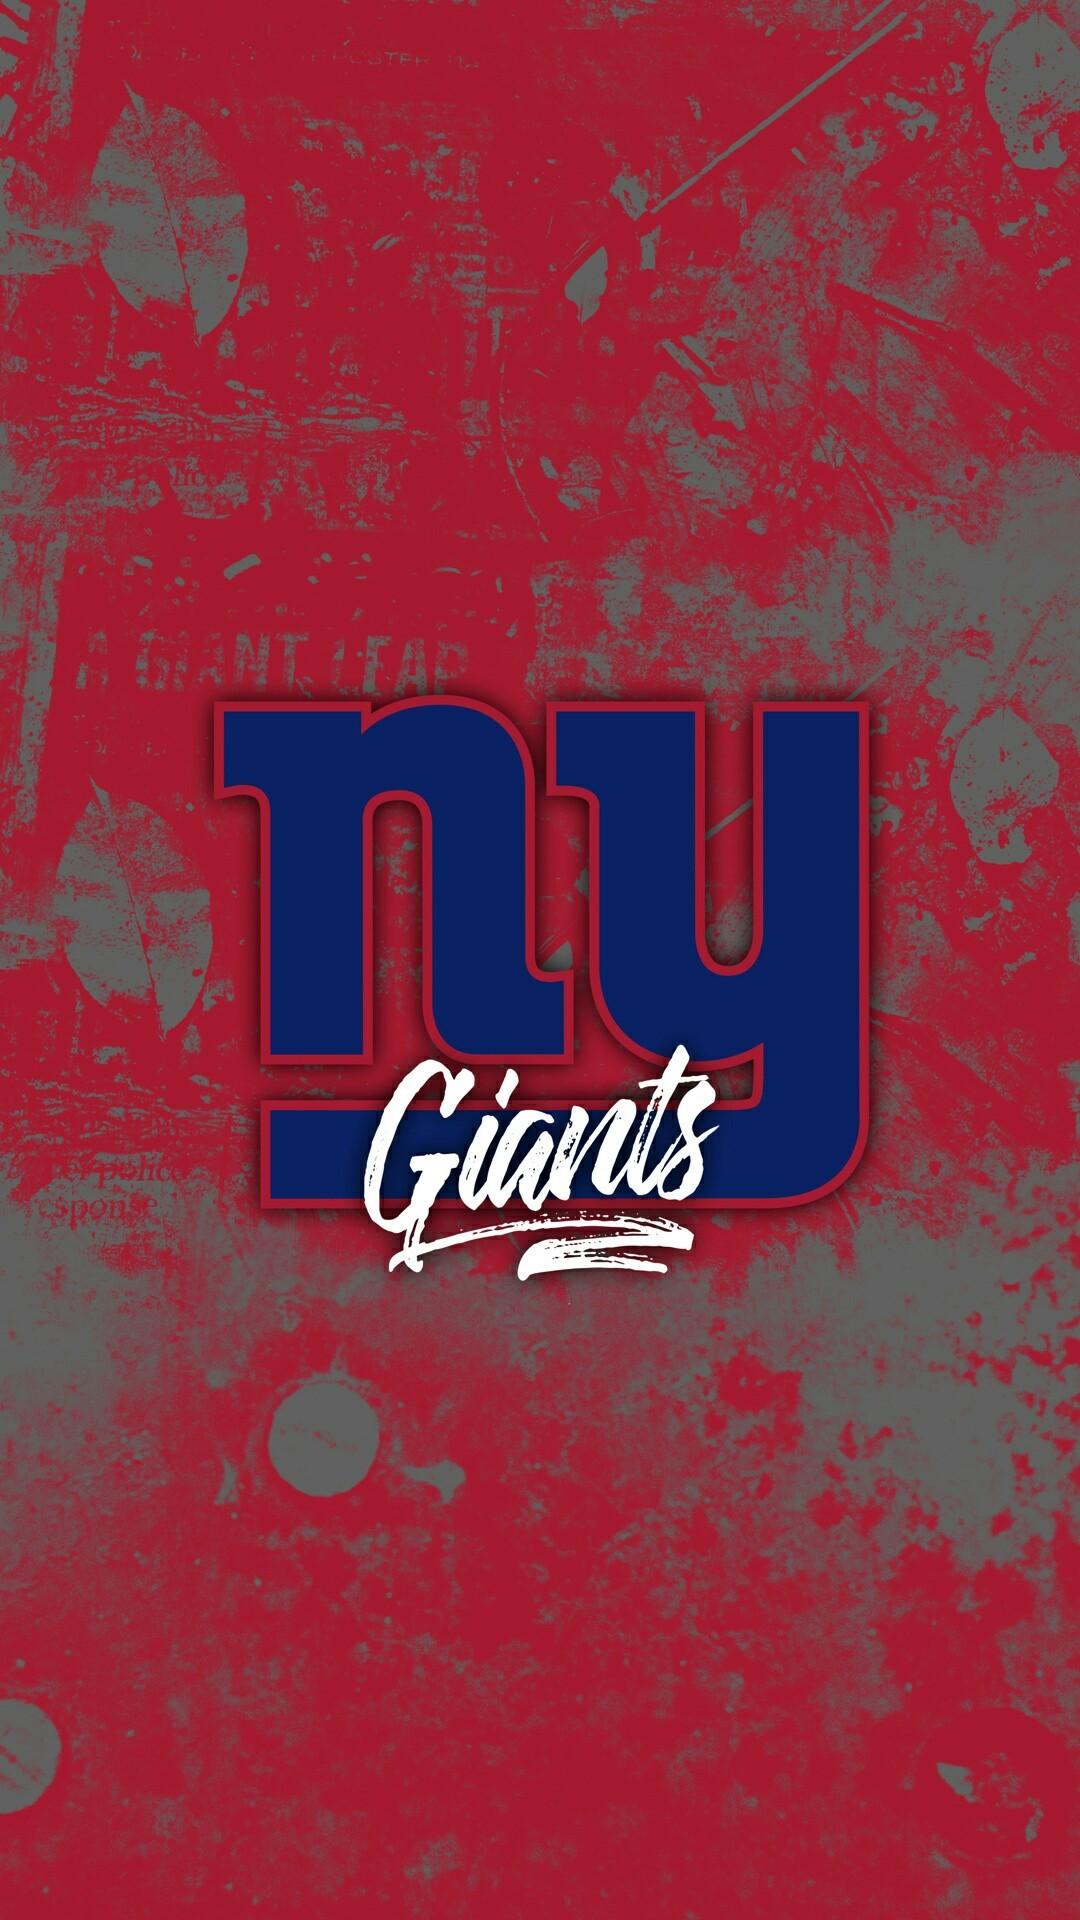 New York Giants Wallpaper iPhone (62+ images)